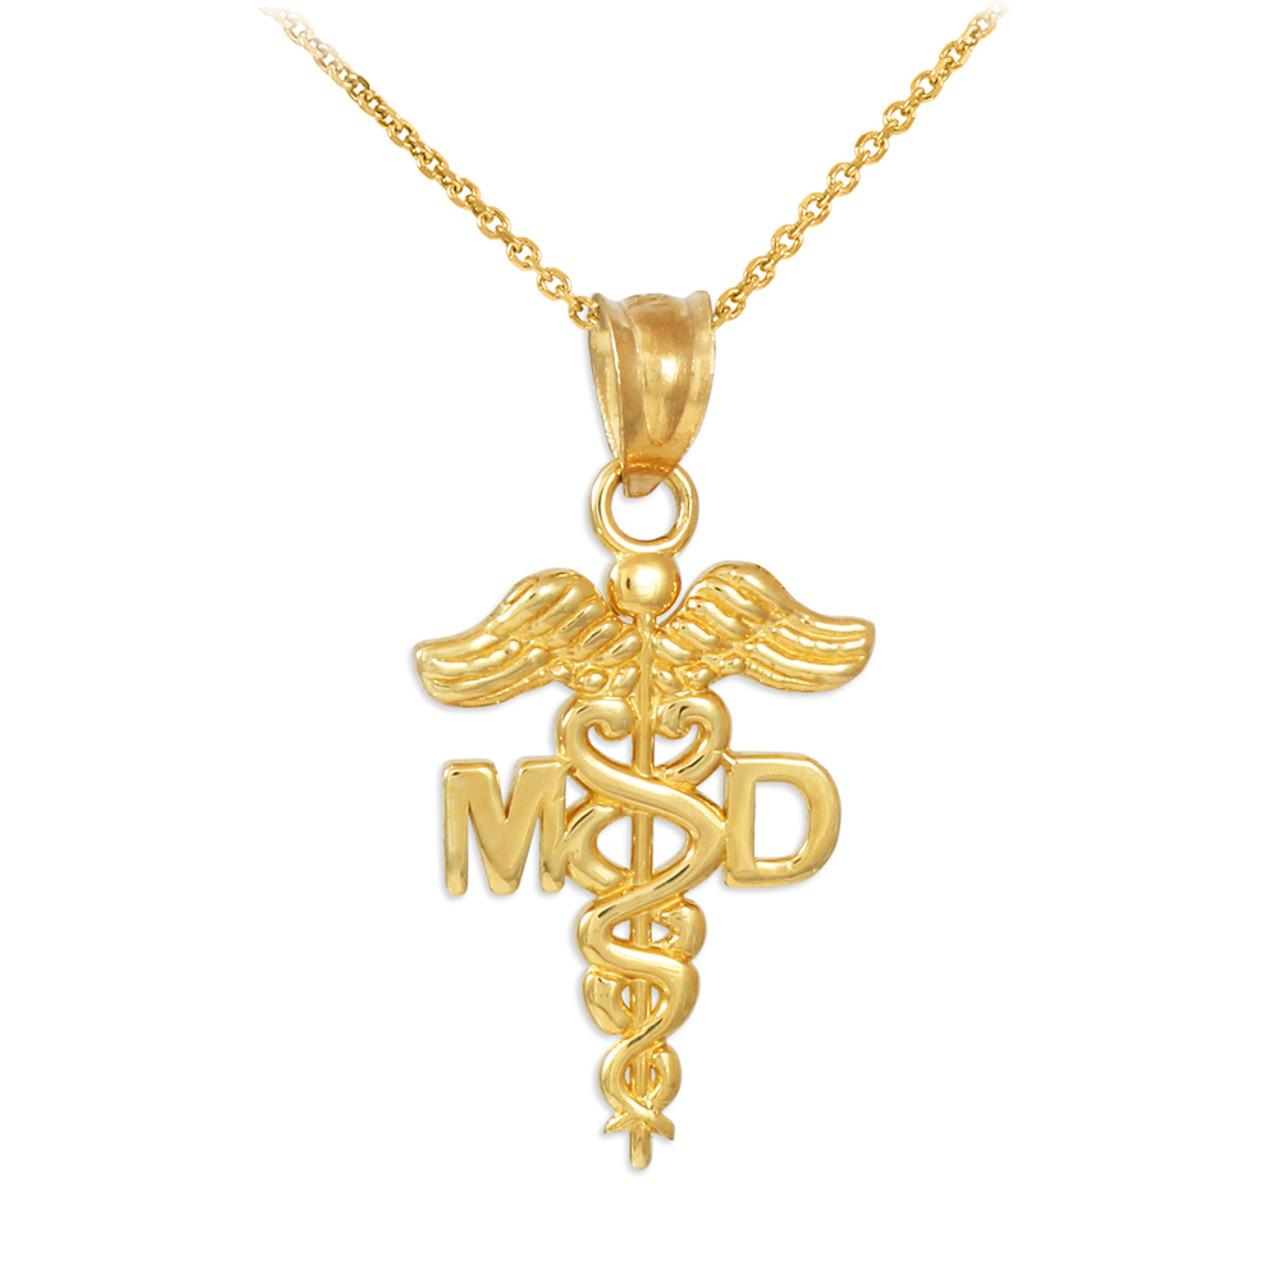 gold doctor md caduceus charm pendant